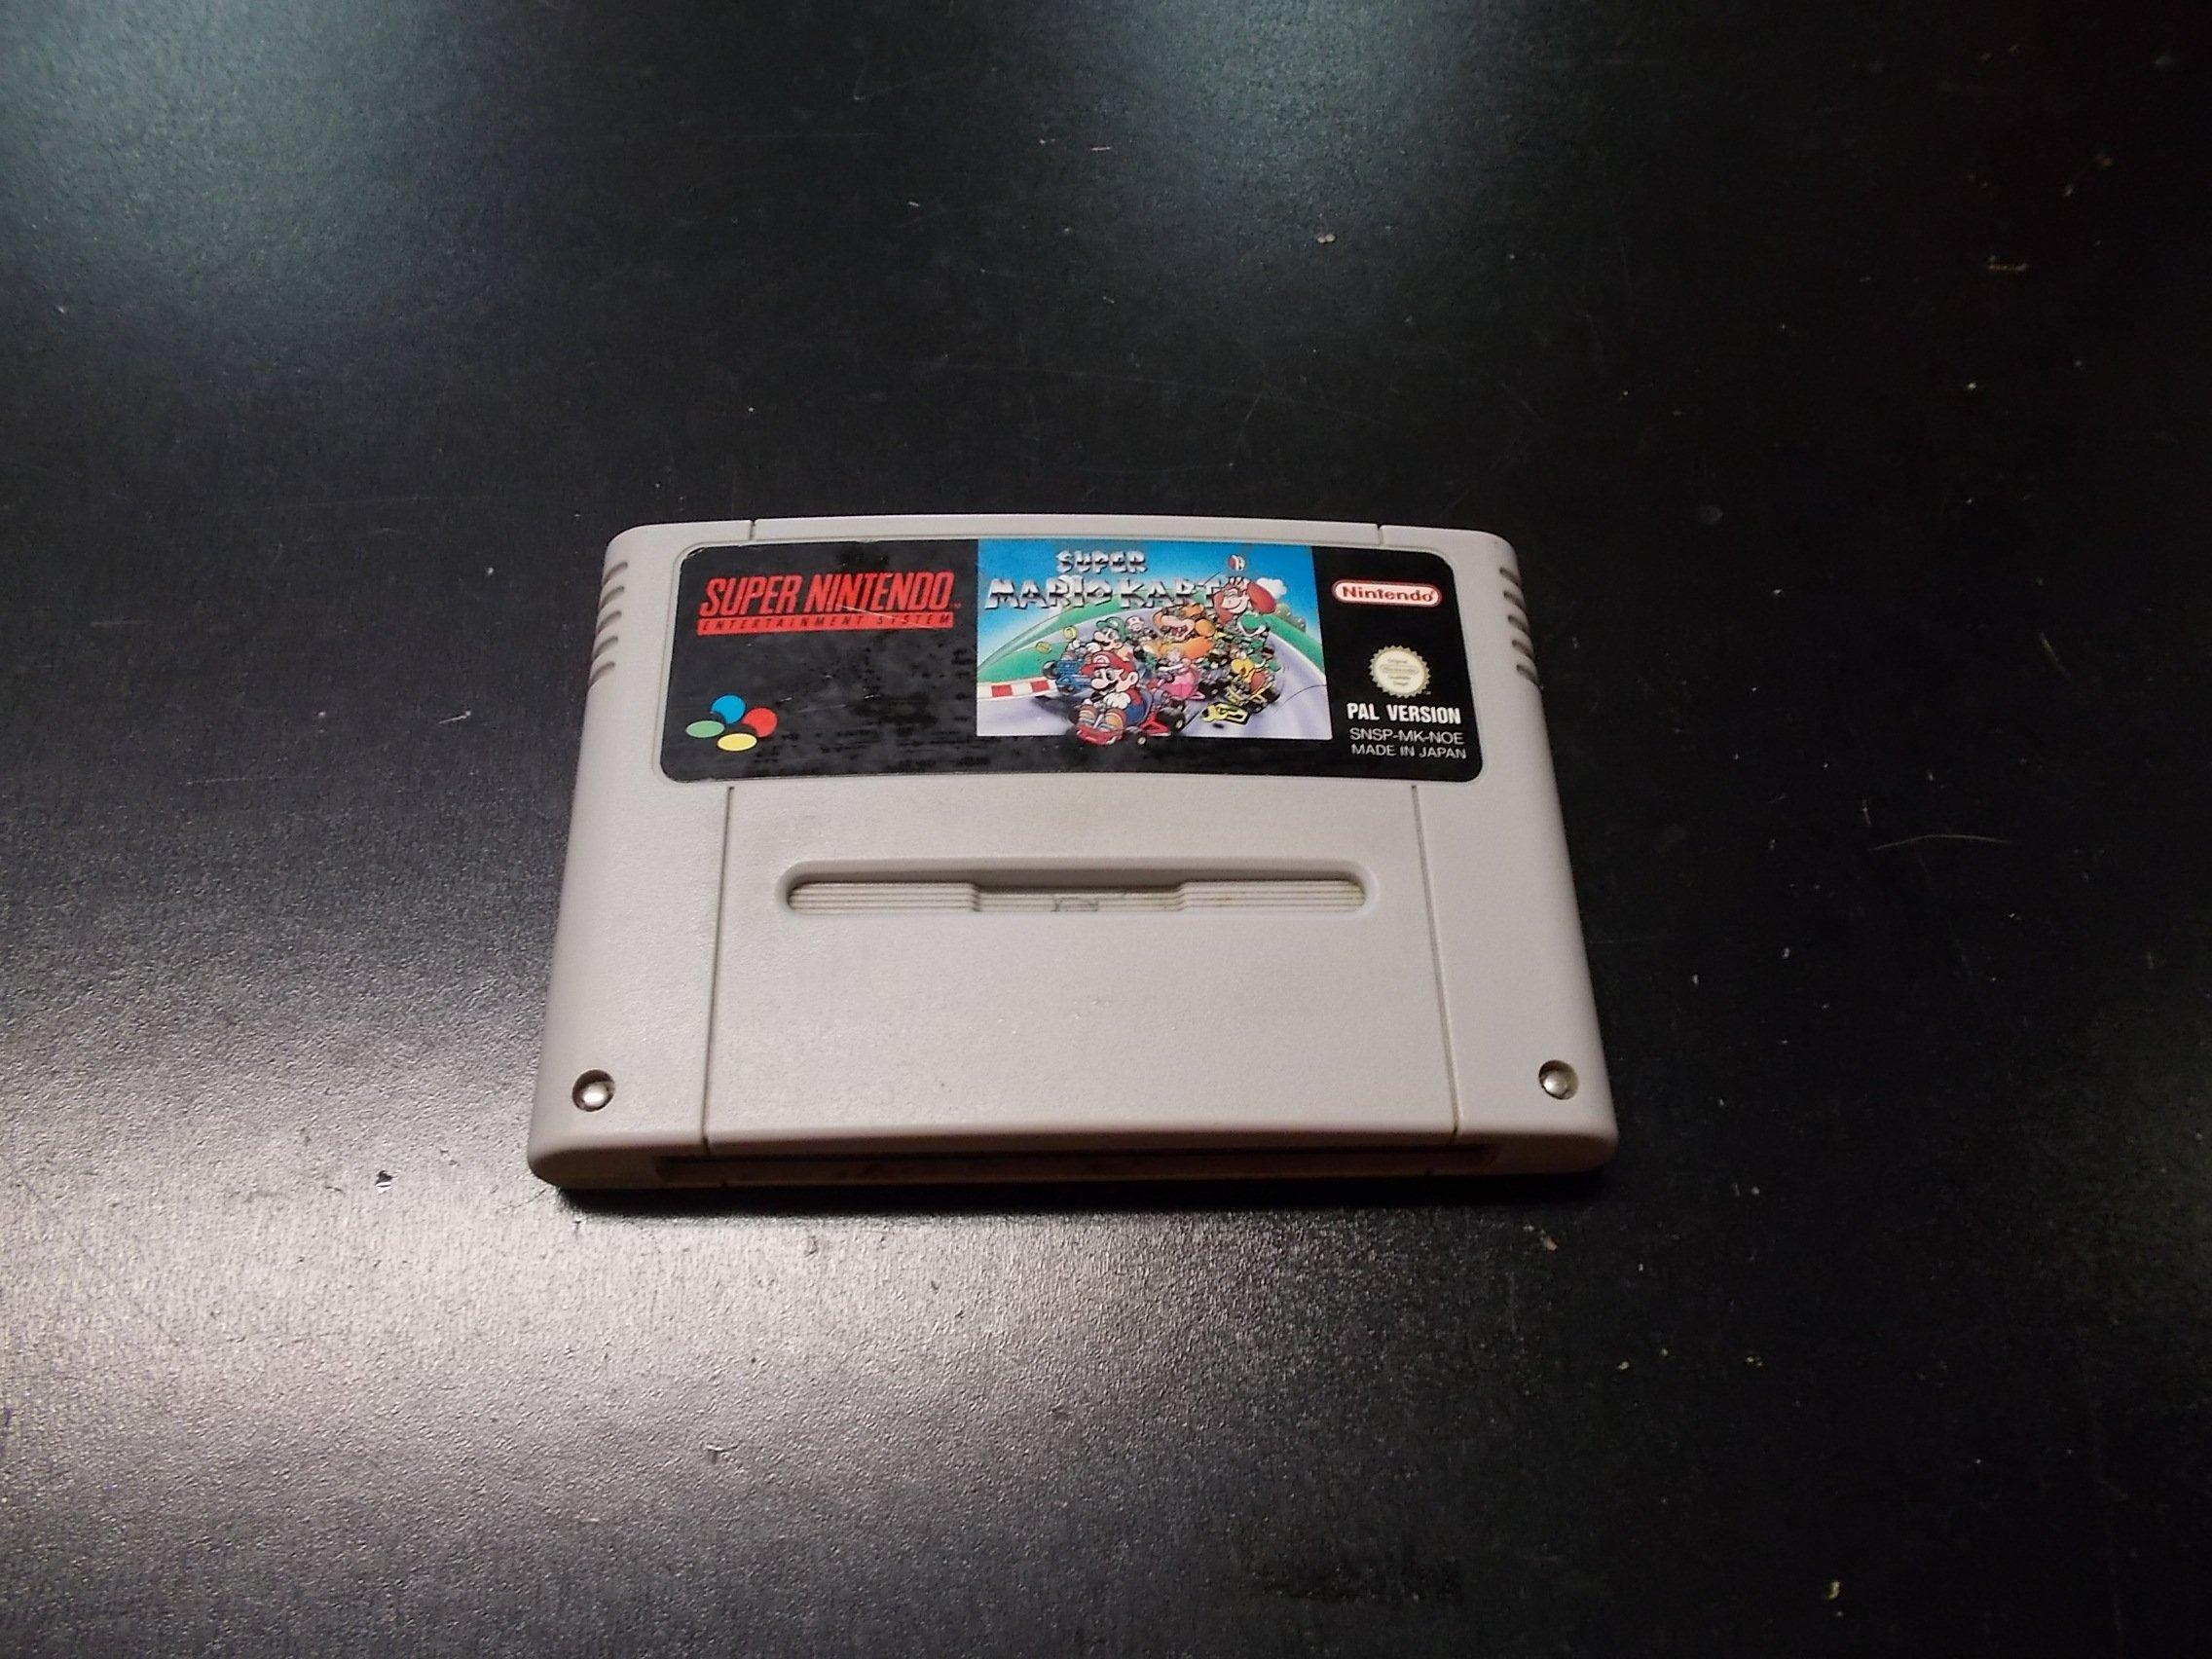 Super Mario Kart - GRA Nintendo SNES Opole 0228